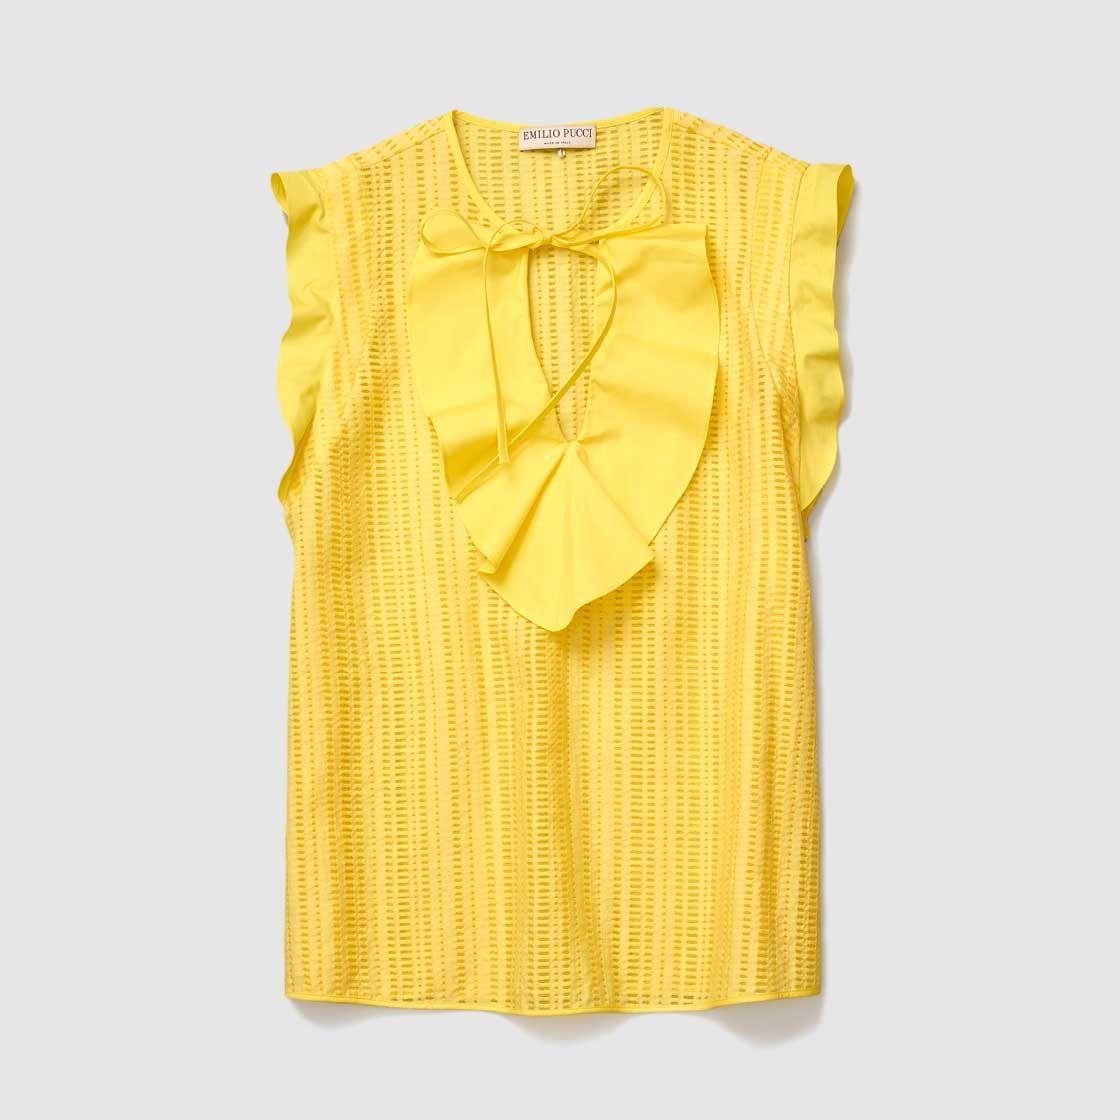 7b339eaac mytheresa.com - Home - Luxury Fashion for Women / Designer clothing, shoes,  bags